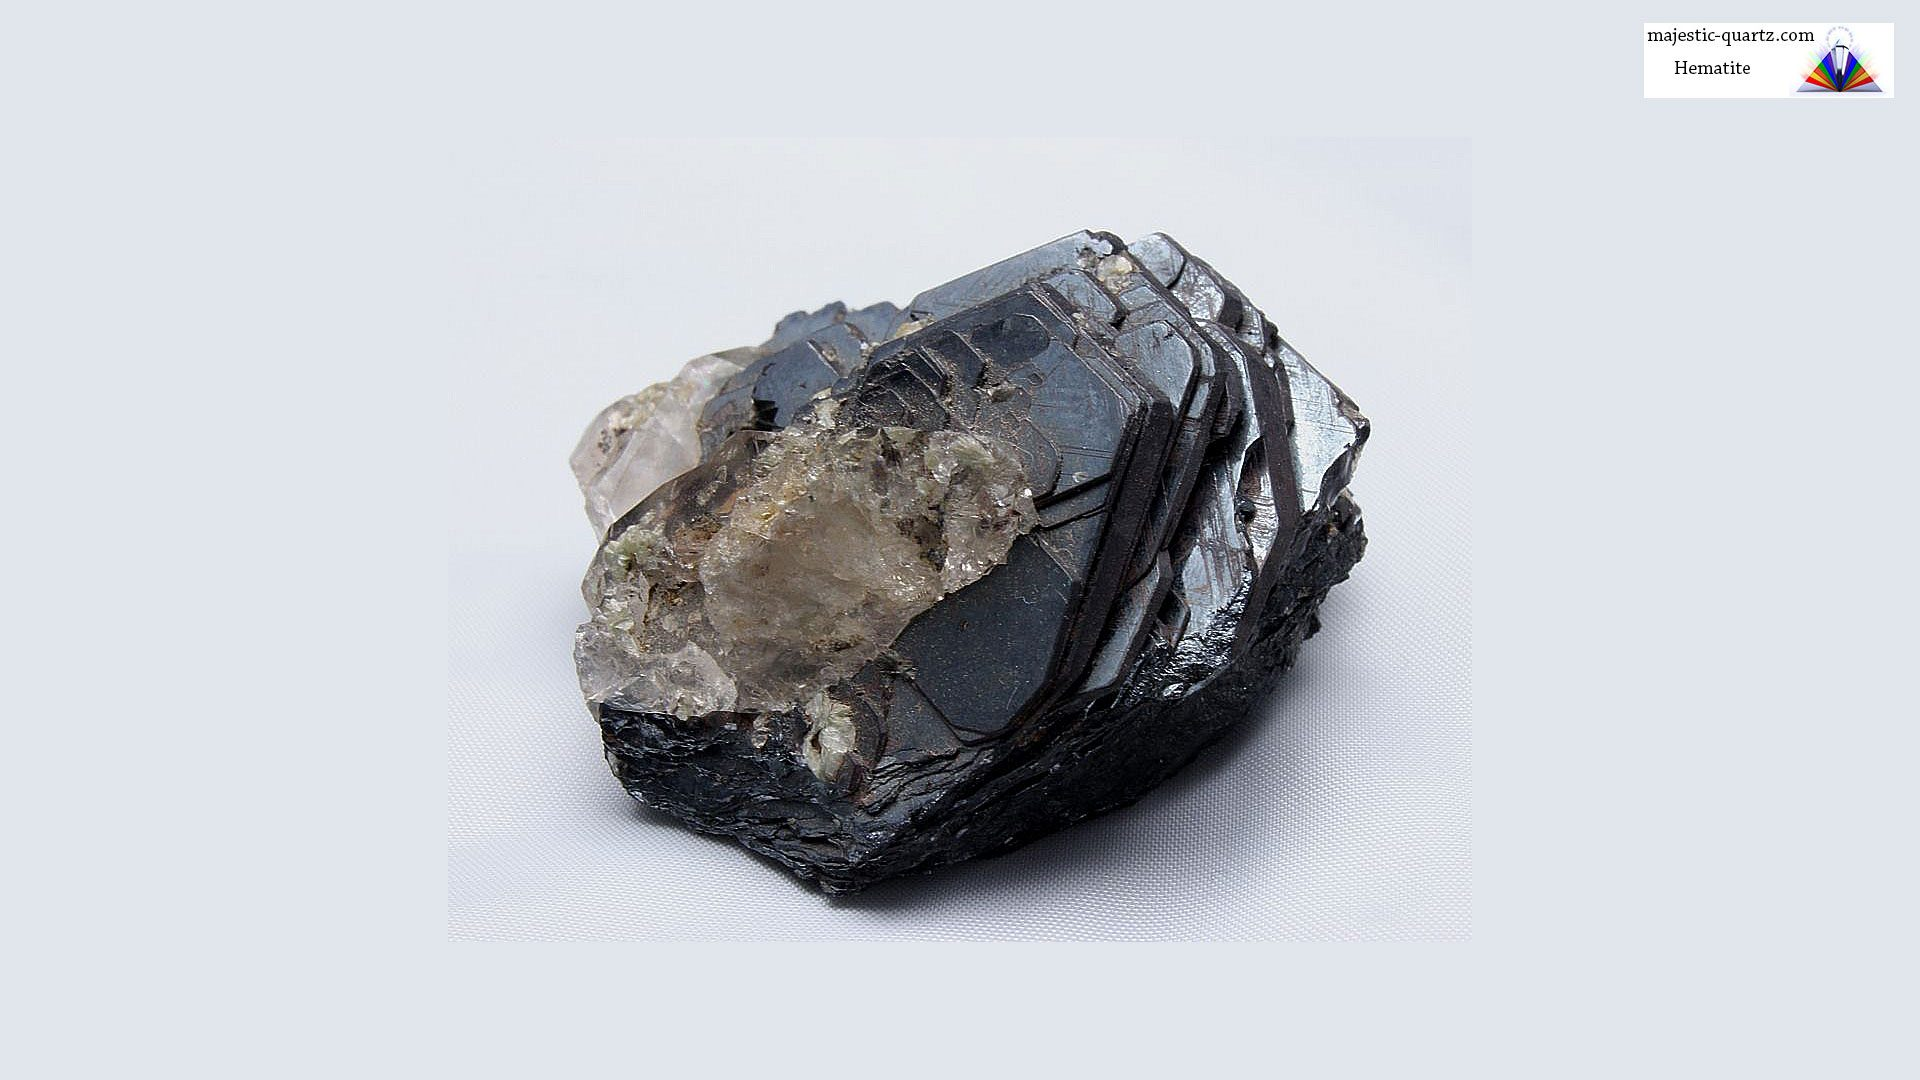 Hematite Crystal Specimen - Mineral Specimen